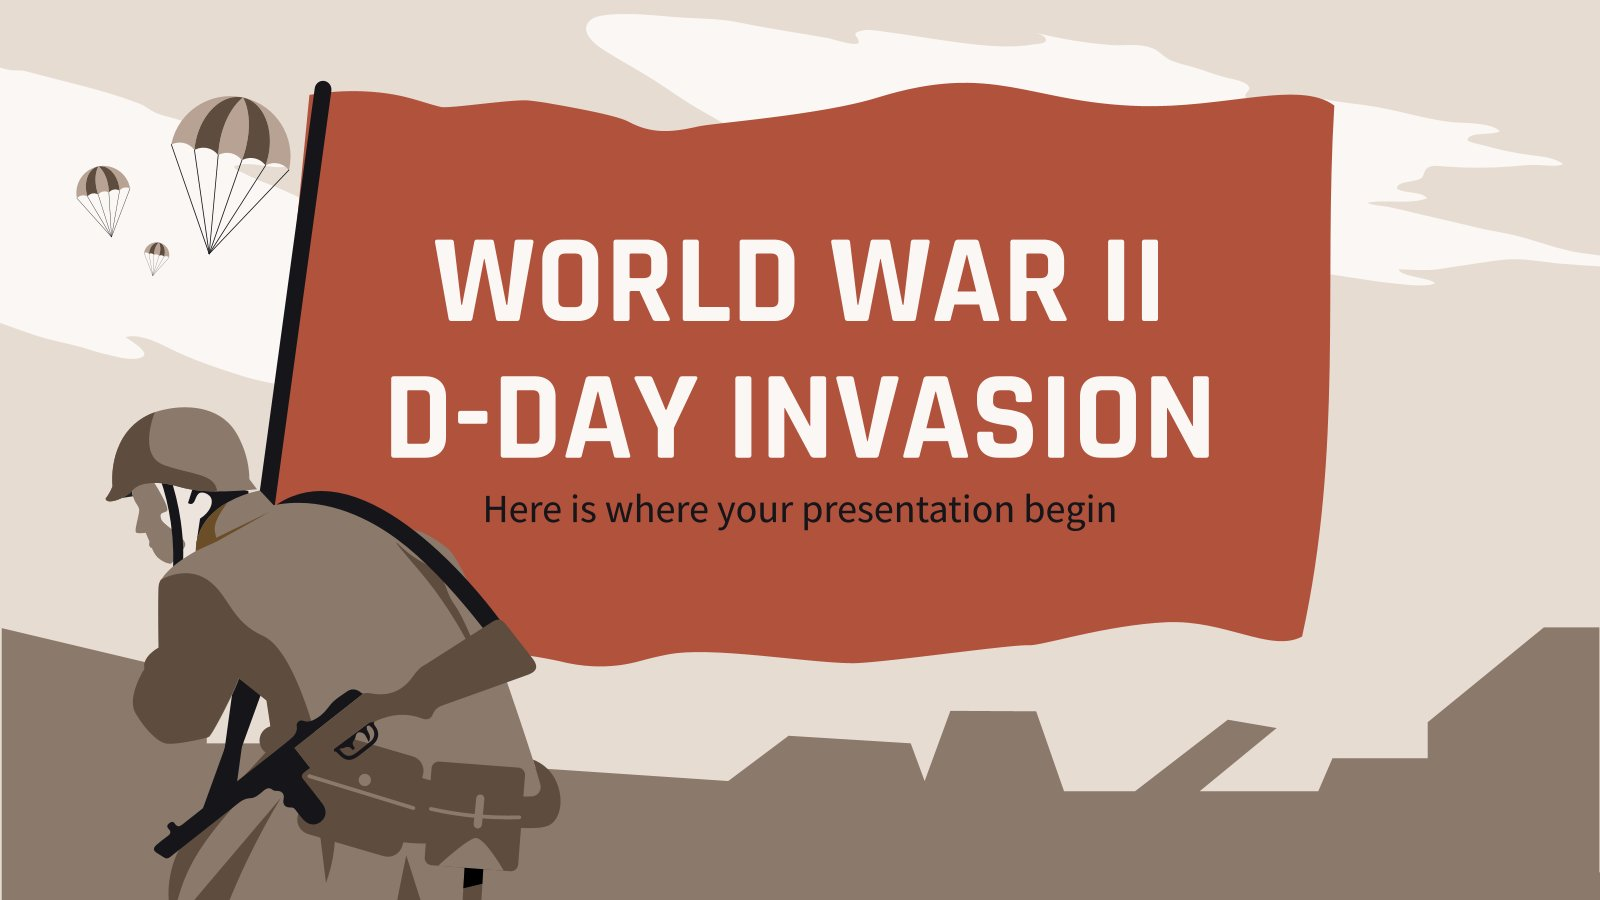 World War II D-Day Invasion presentation template